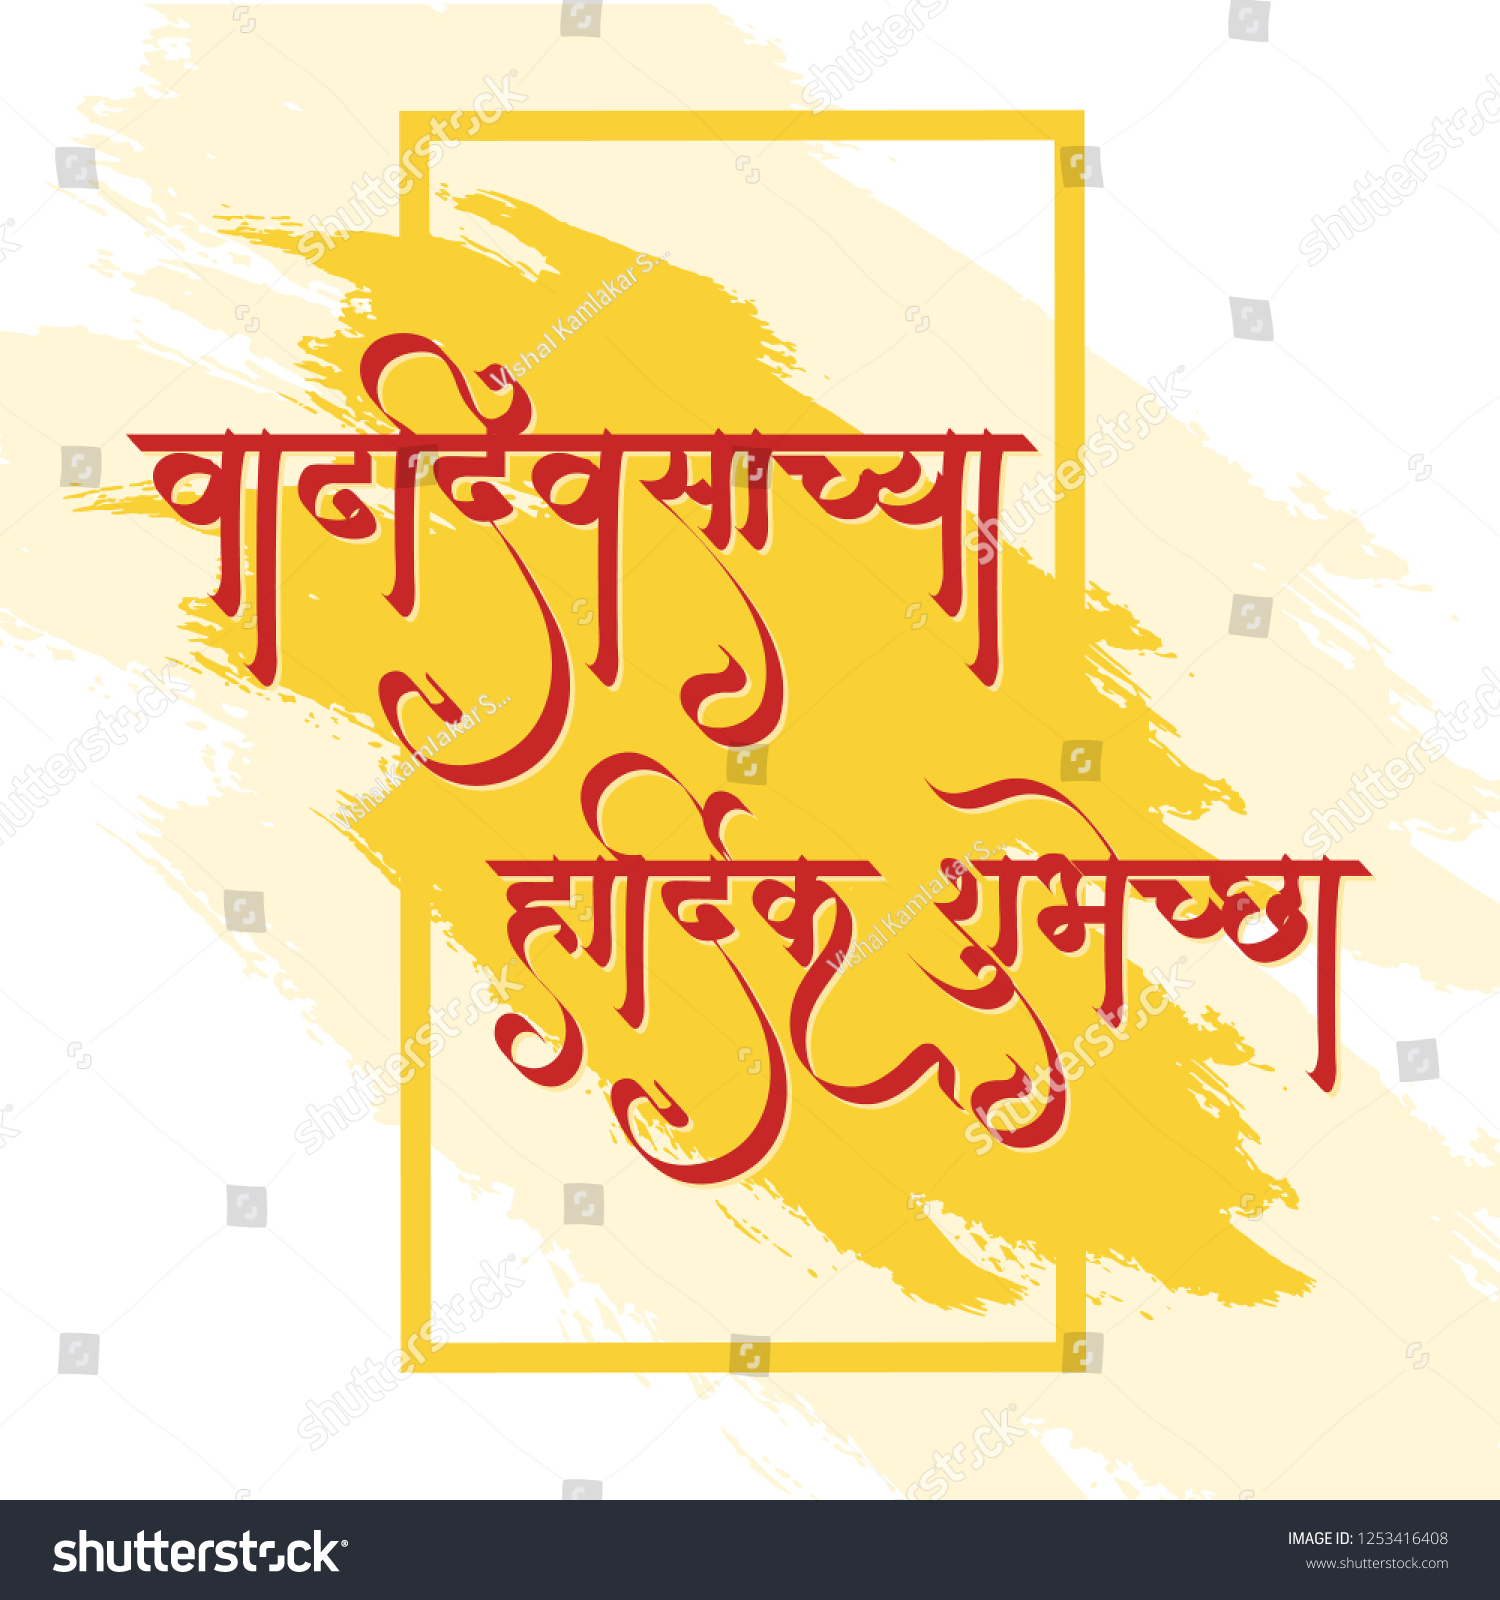 Marathi Calligraphy Vaddivsacha Hardik Shubhechha Happy Birthday Wishes Message